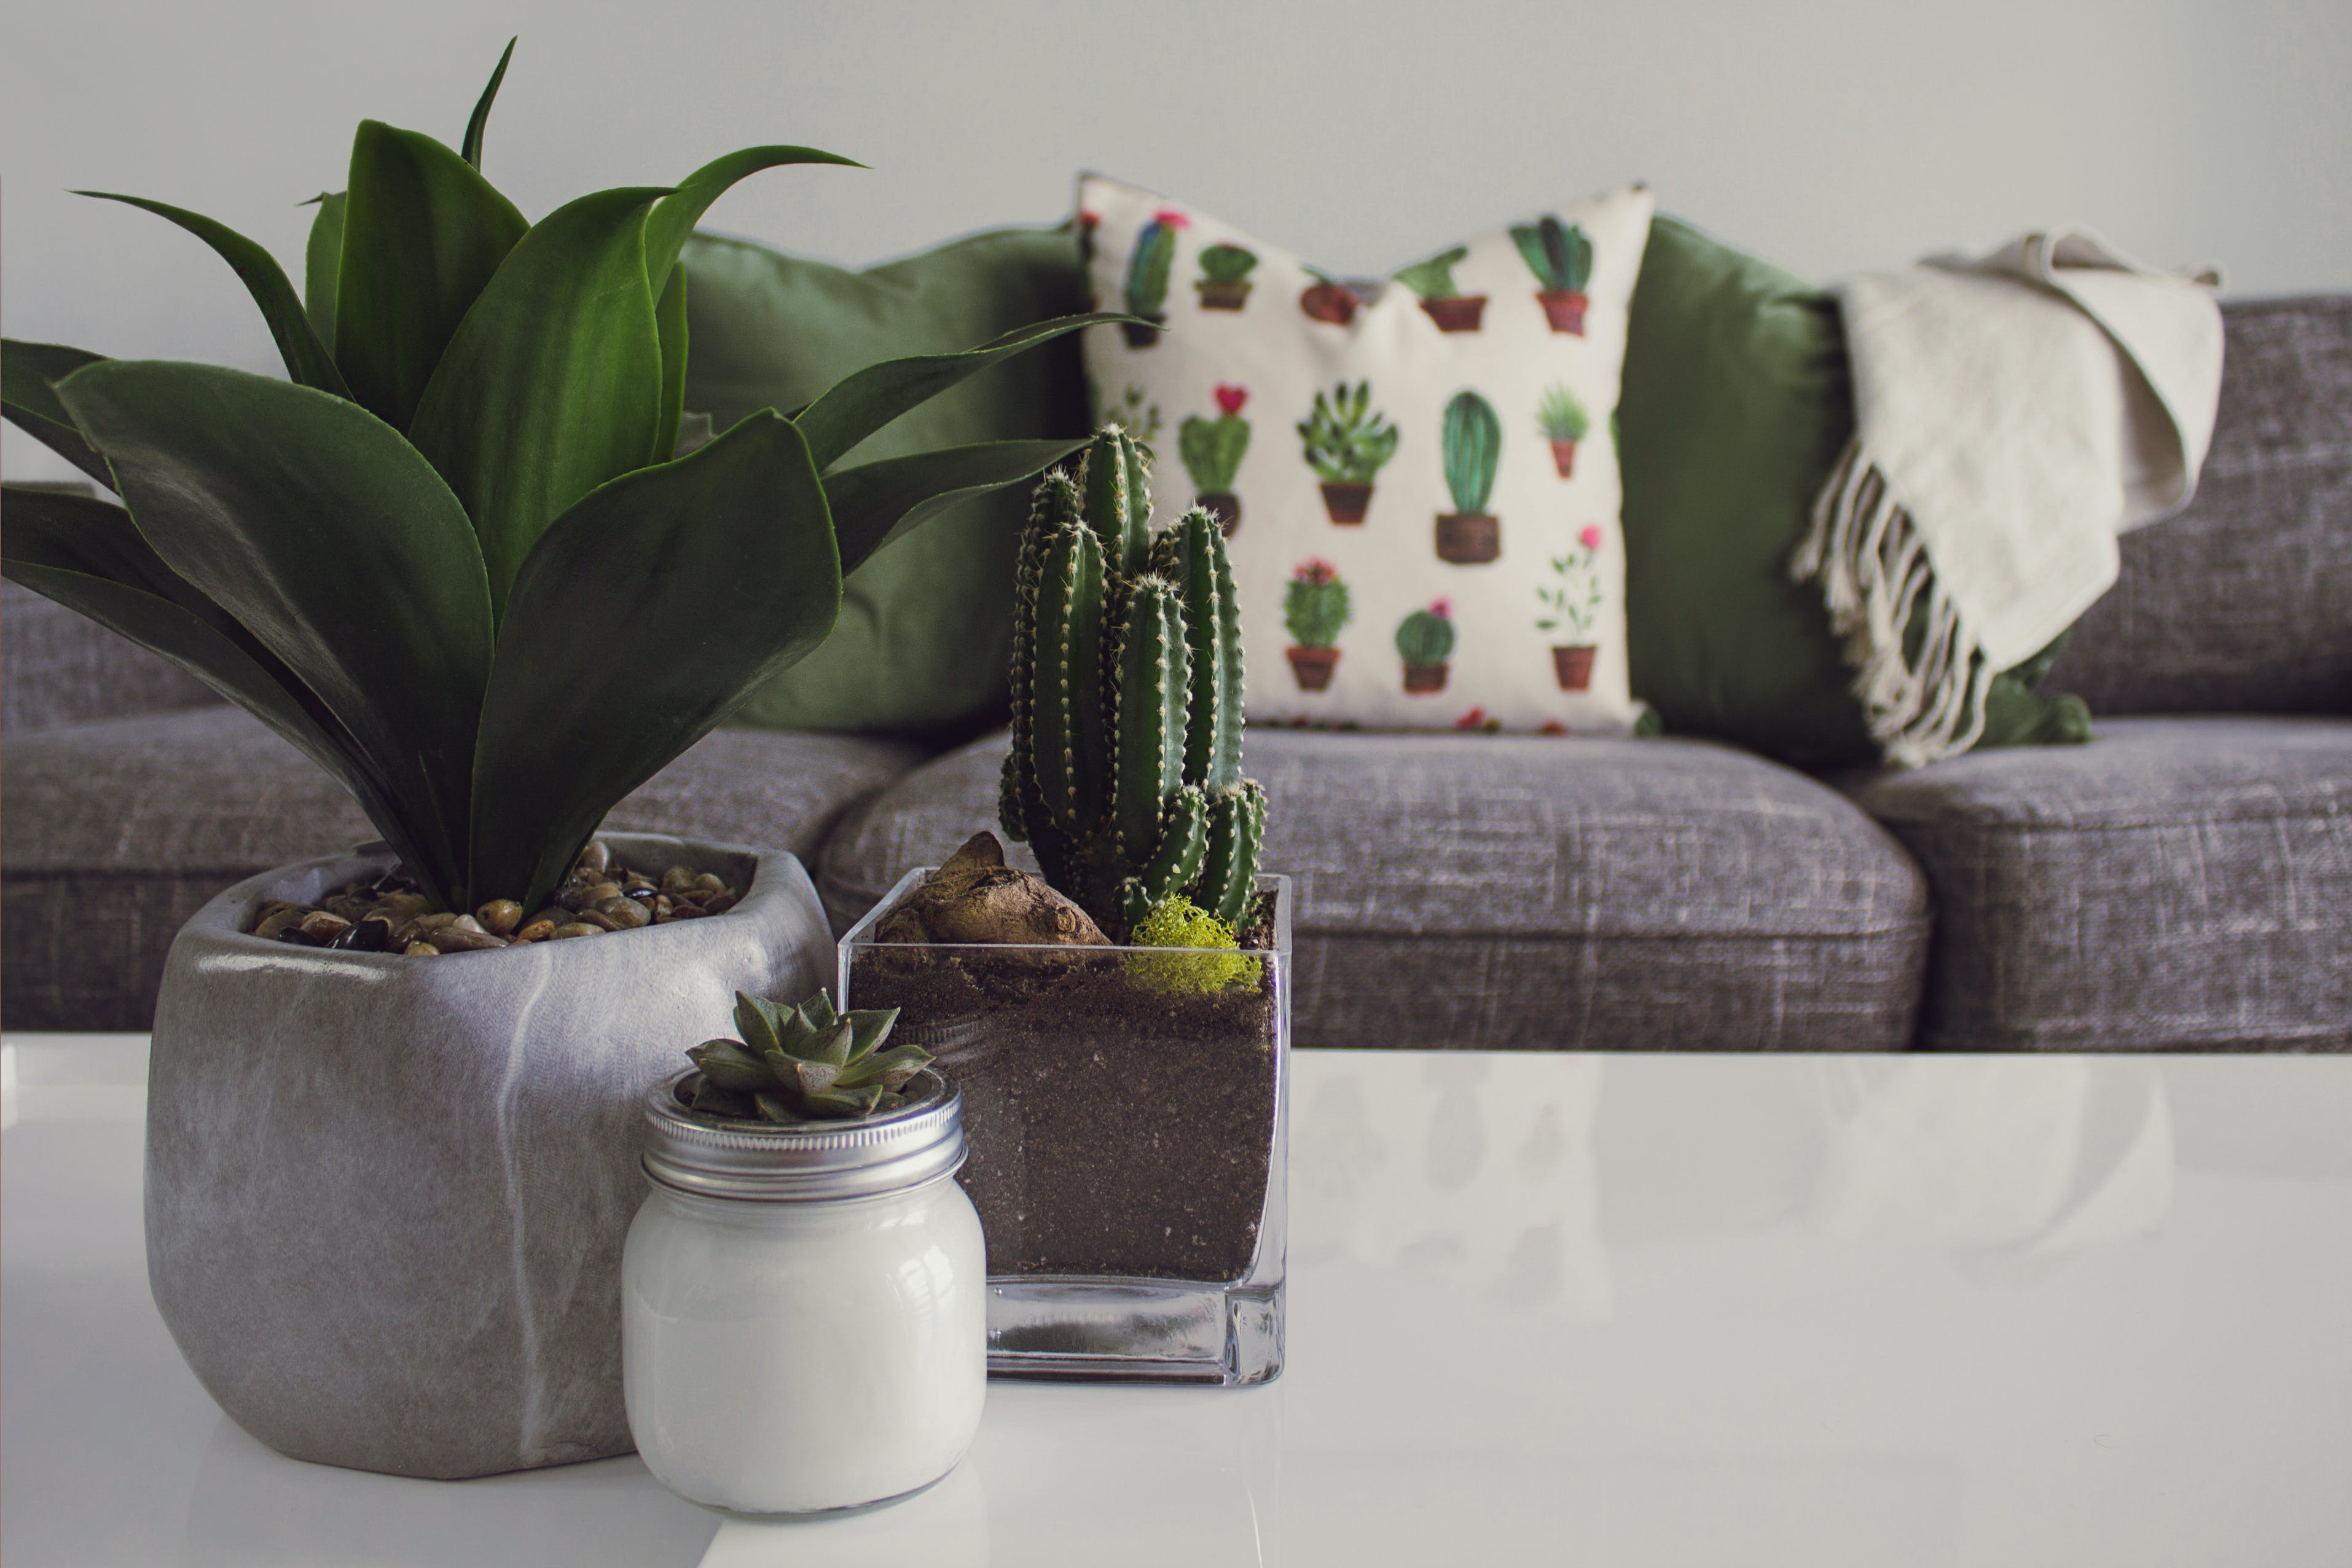 Indoor plants - Top Diwali gifts for friends in 2018